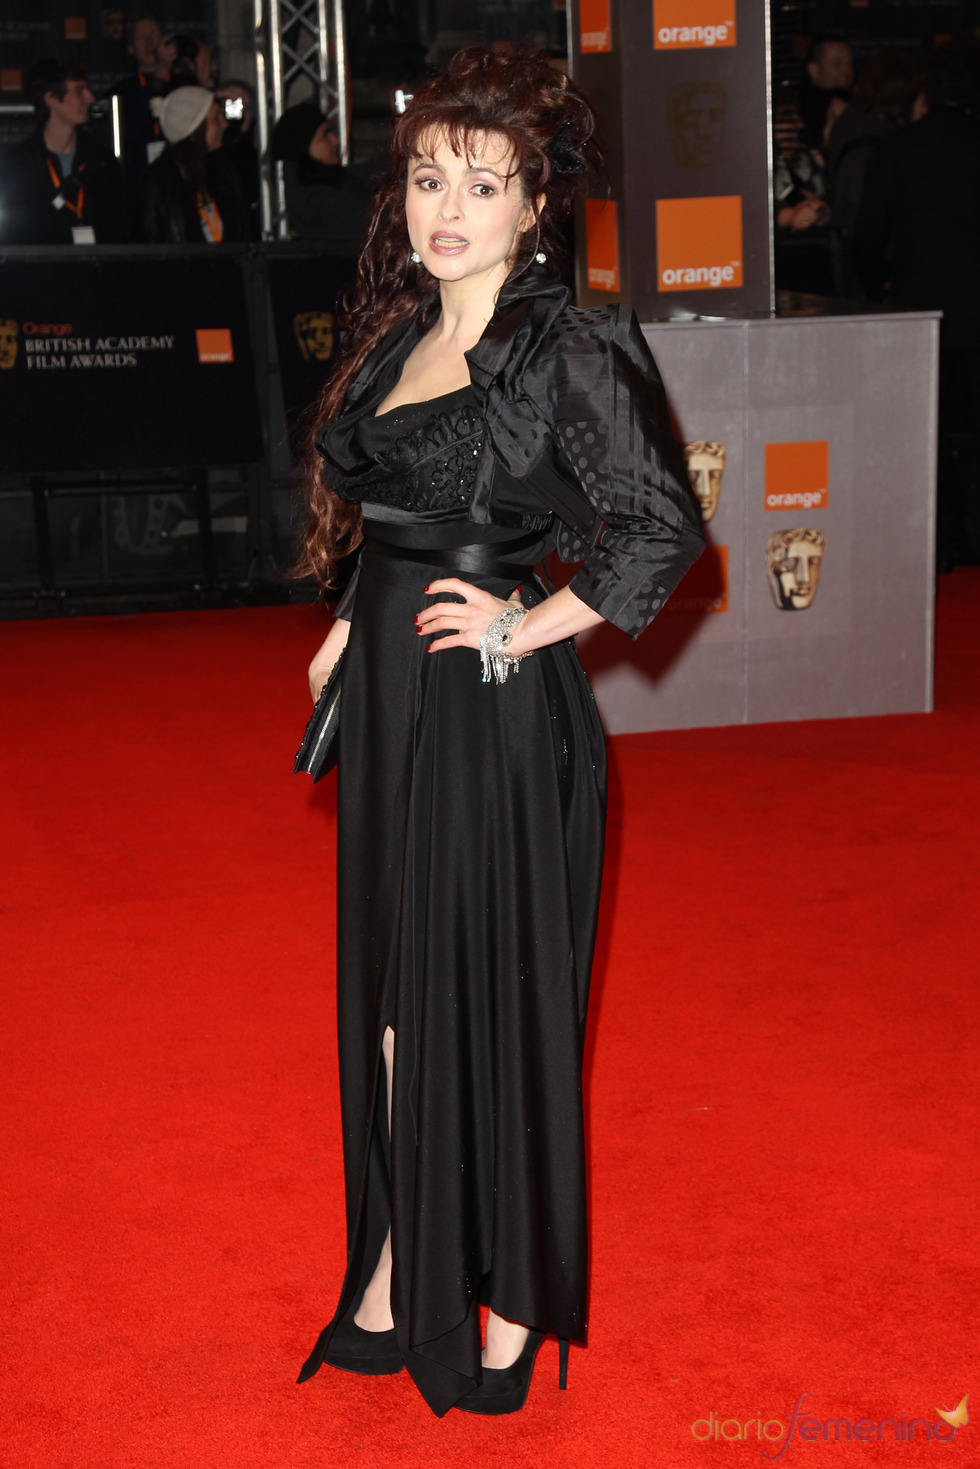 Helena Bonham Carter en la alfombra roja de los Bafta 2011